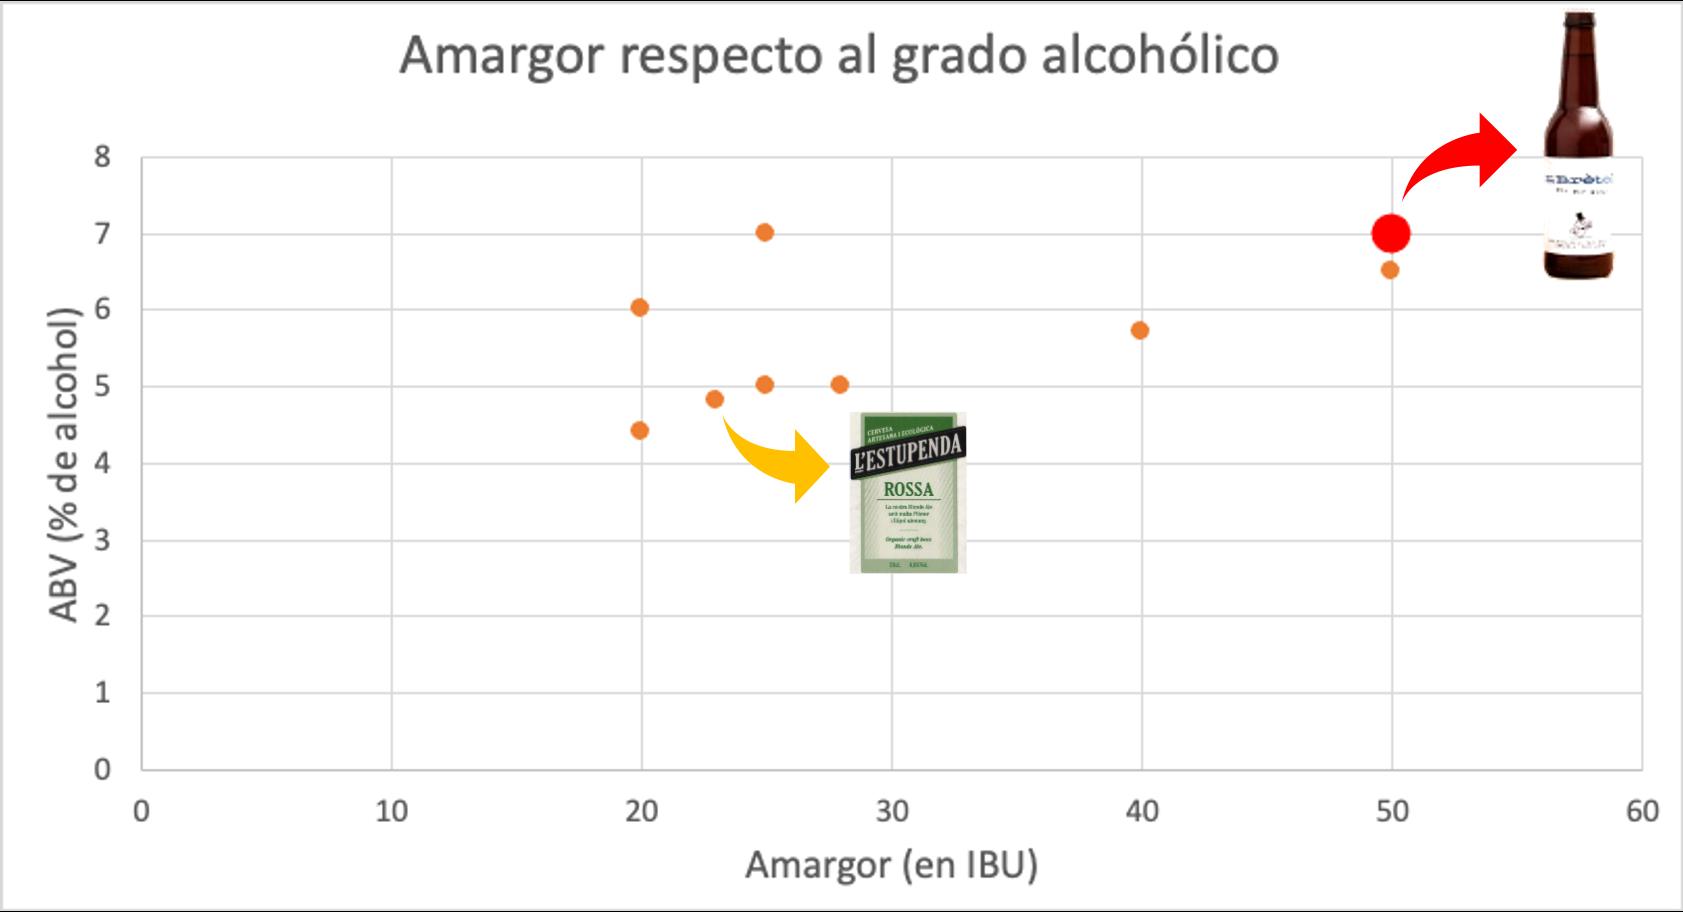 https://www.lestupenda.com/wp-content/uploads/2021/05/cervesa-artesana-lestupenda-el-bretol-wip-wip-wipa-4.png